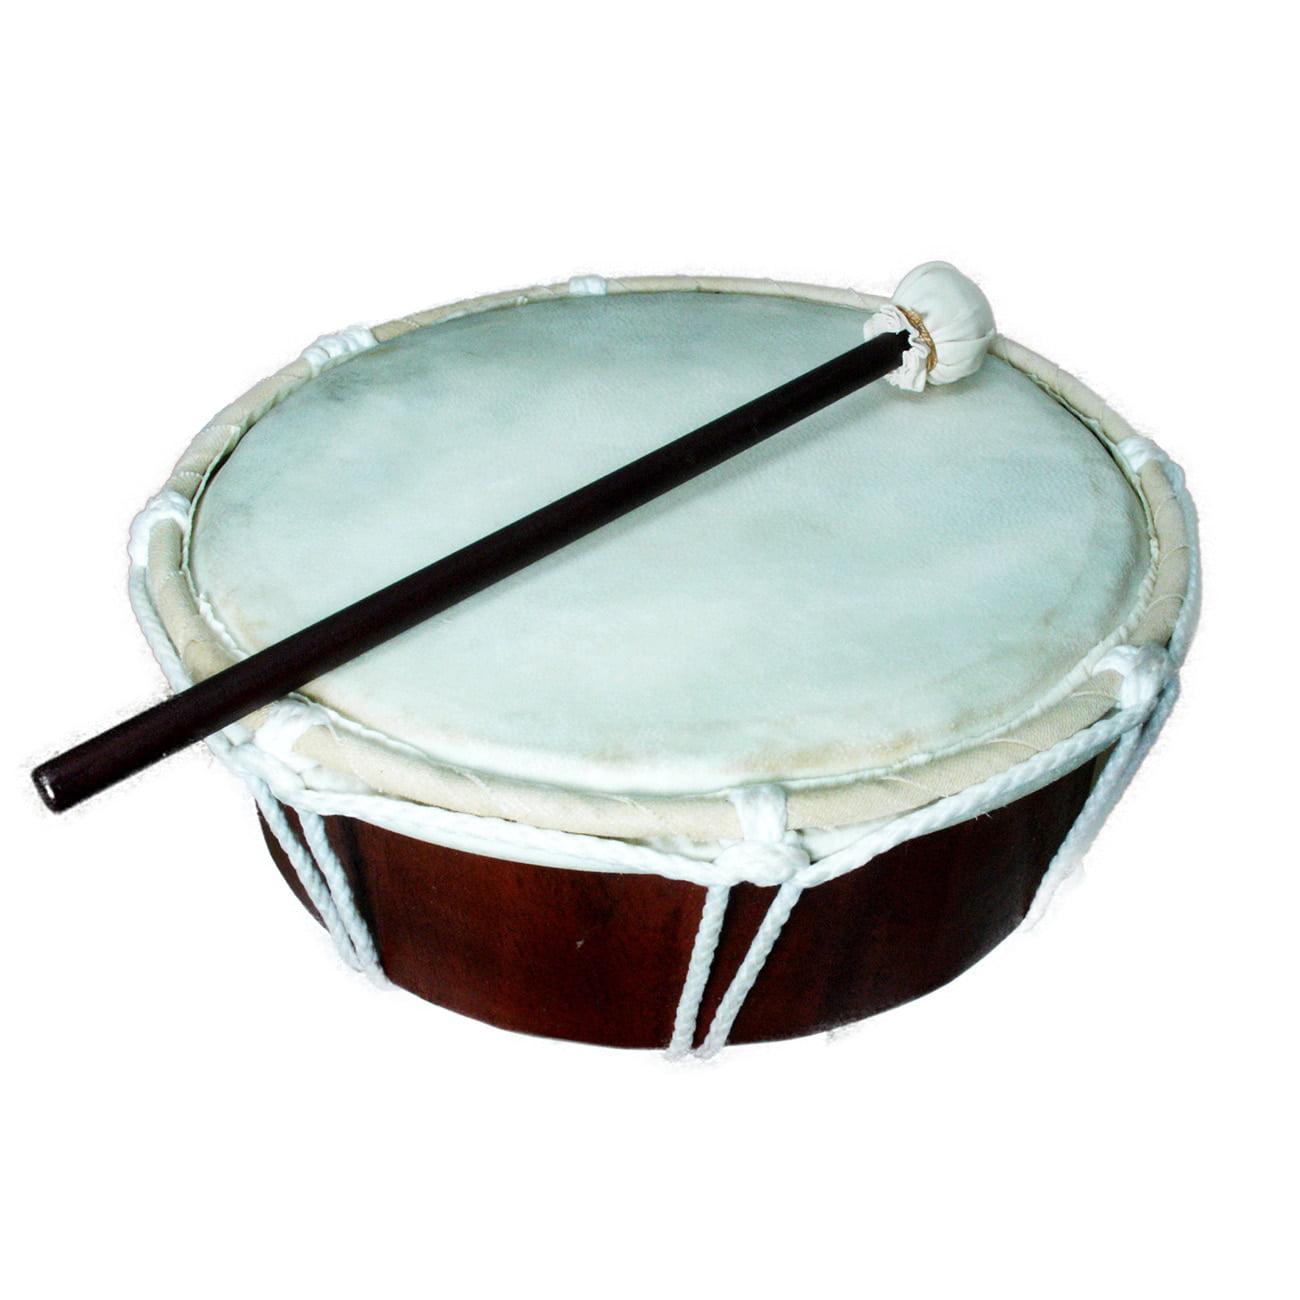 Stoneage Arts Handmade Drum W/Stick Natural (Indonesia)